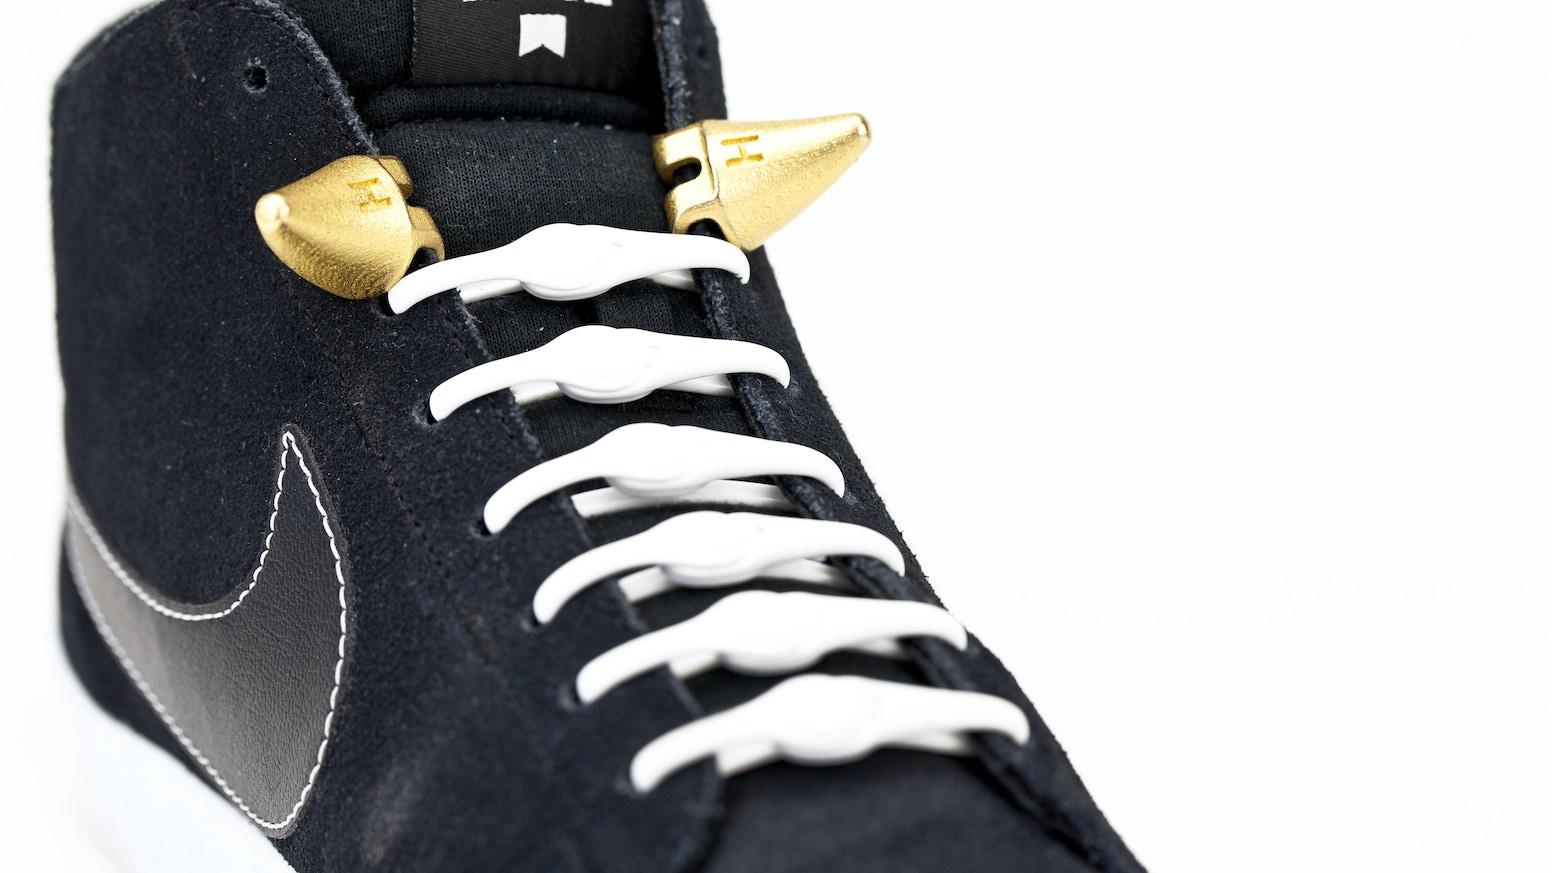 2a5db97f88e PUNGAS - Redesign your footwear by Mariquel & Gaston — Kickstarter